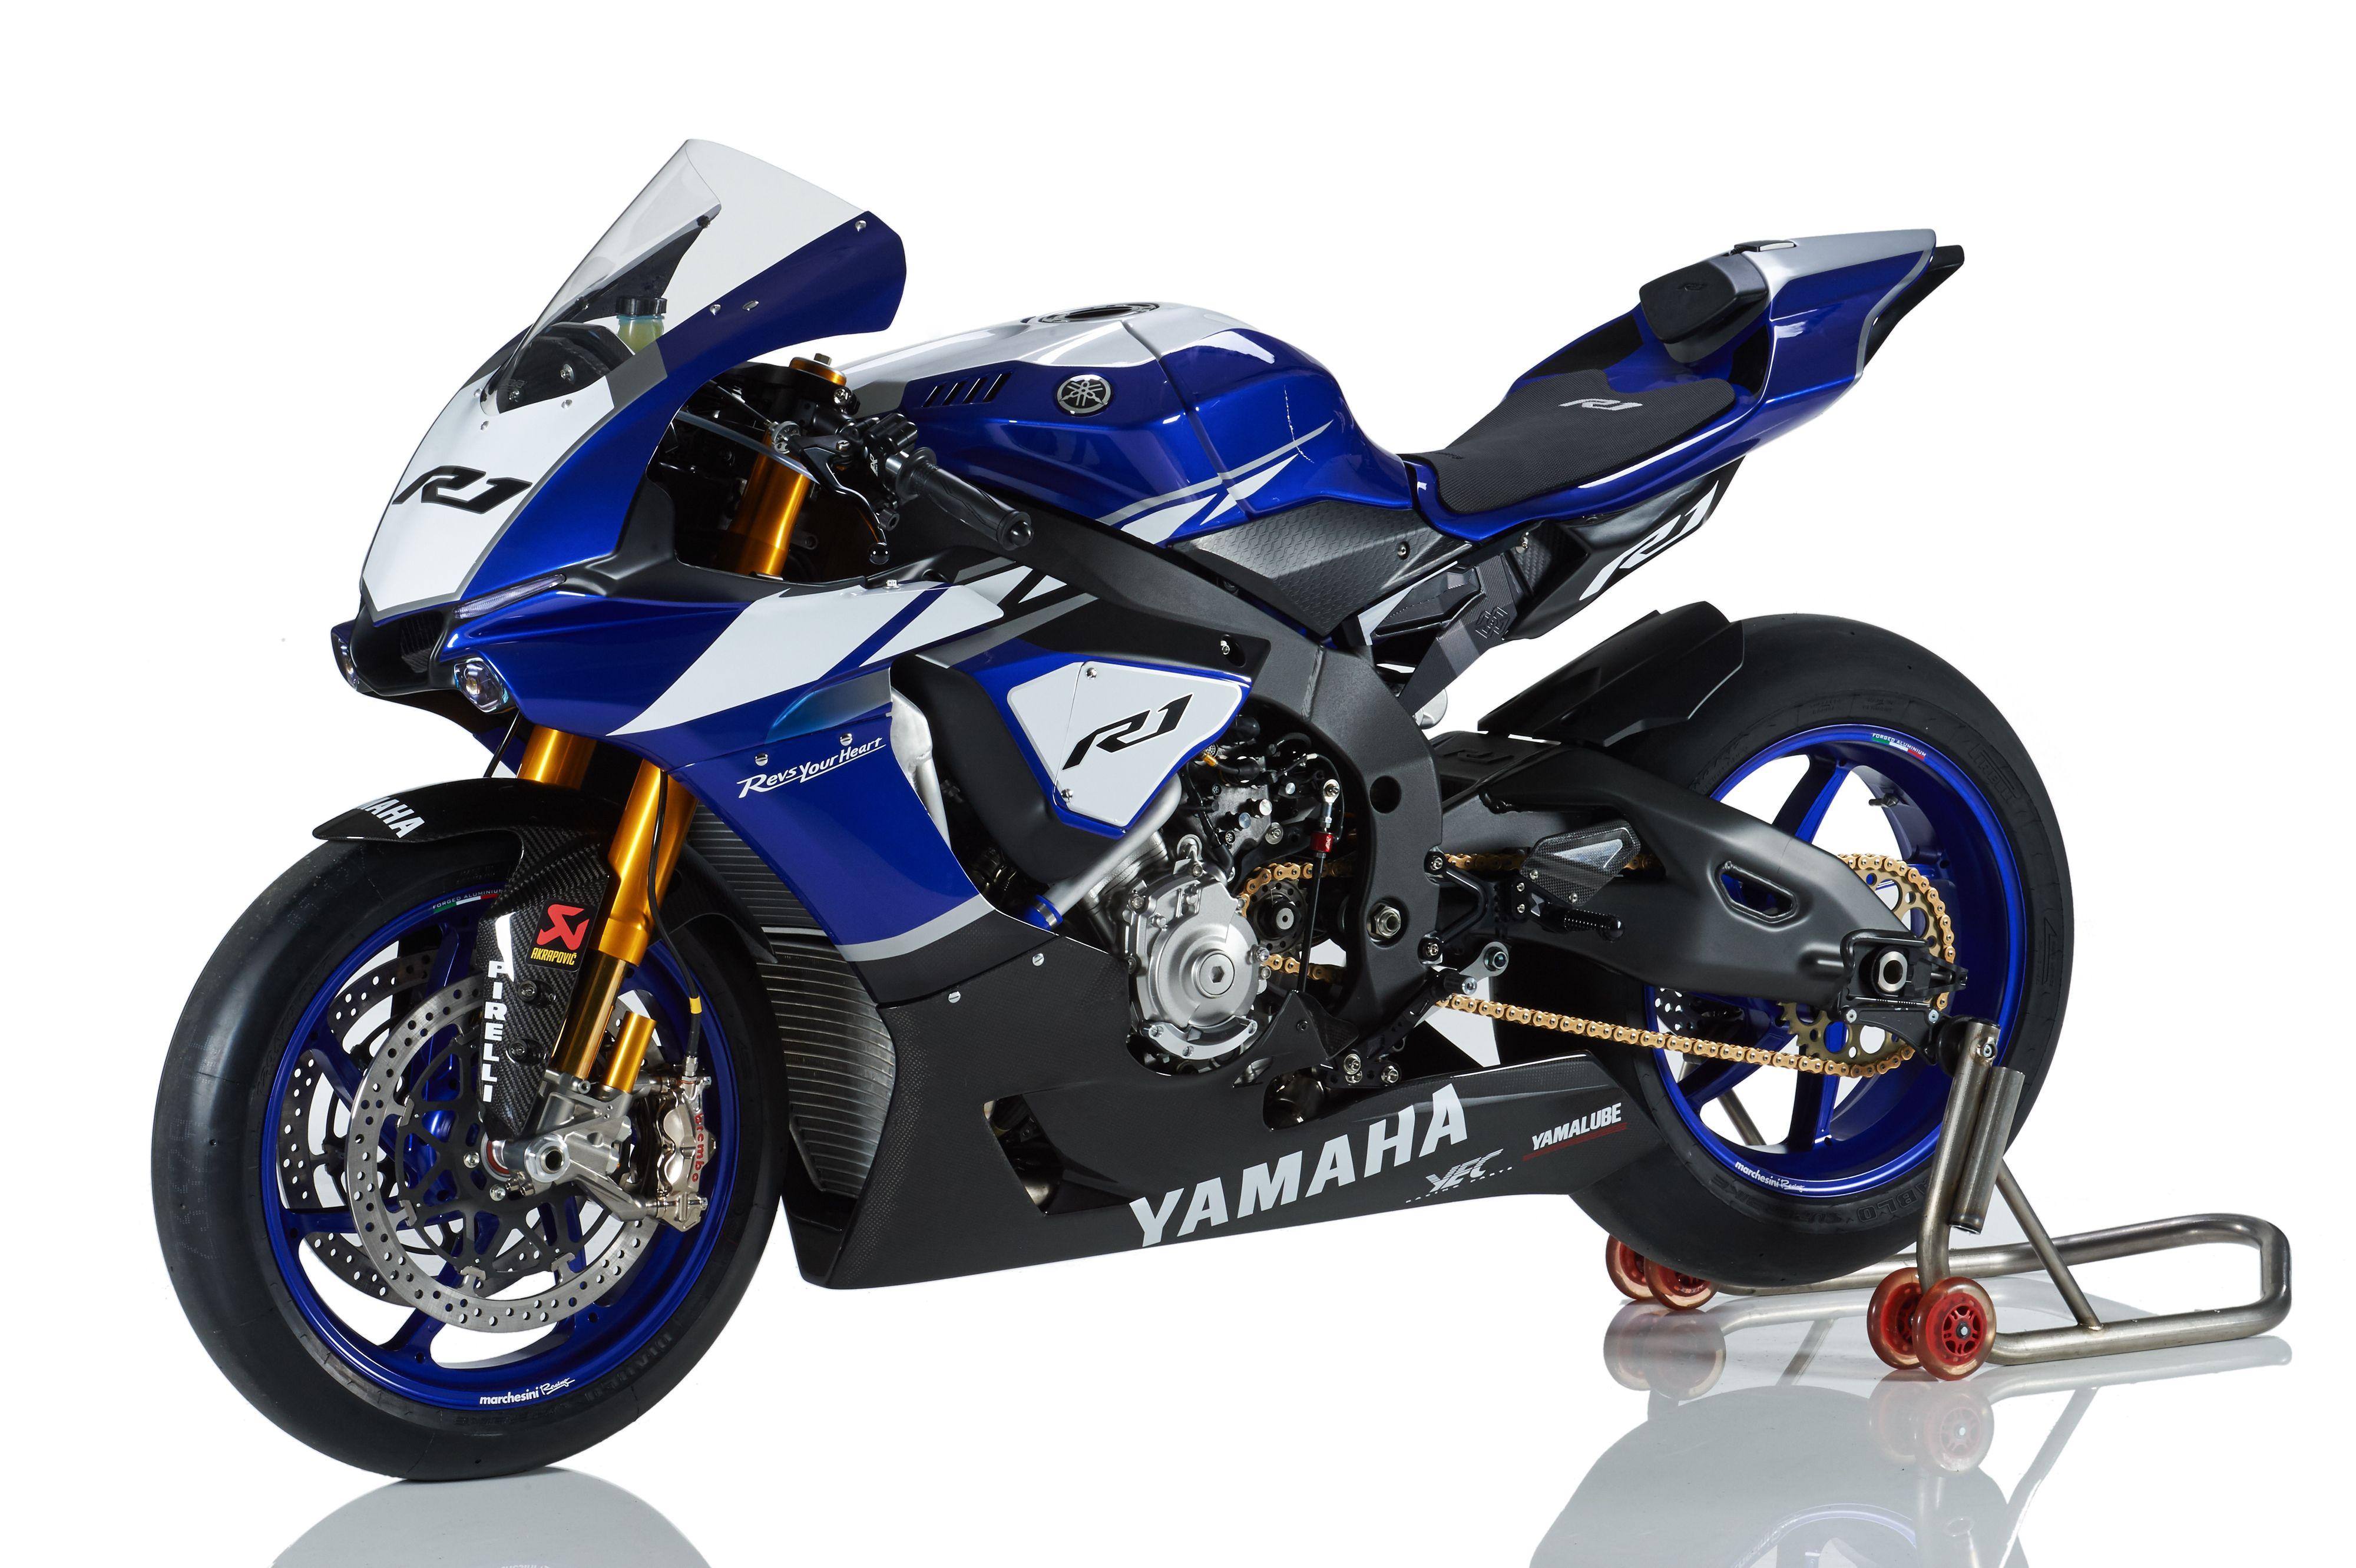 Yamaha YZF R1 Factory Bike 2015